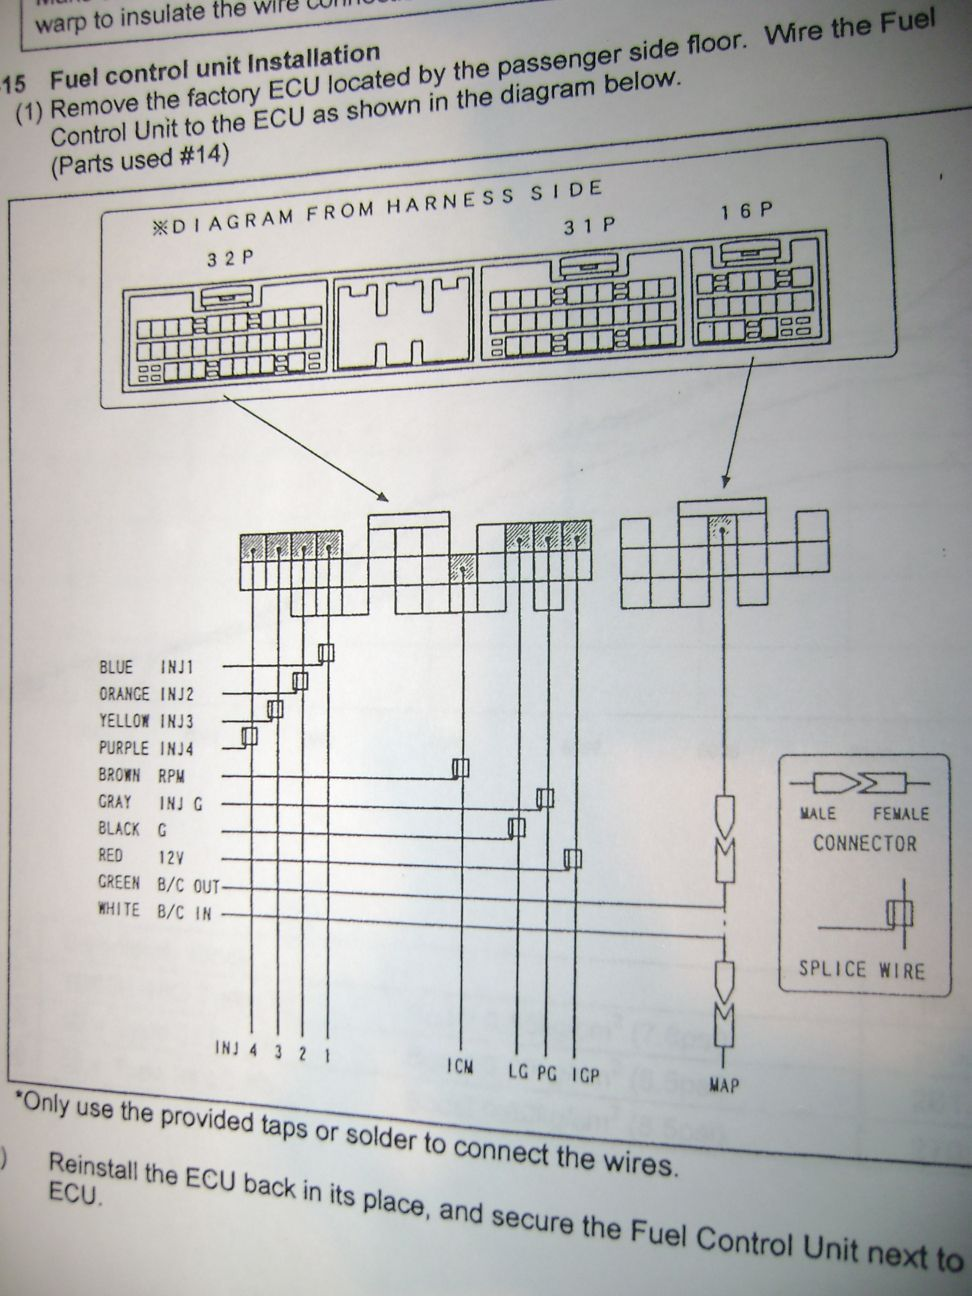 Funky Apexi Safc Obdo Honda Wiring Diagram Crest - Electrical ...